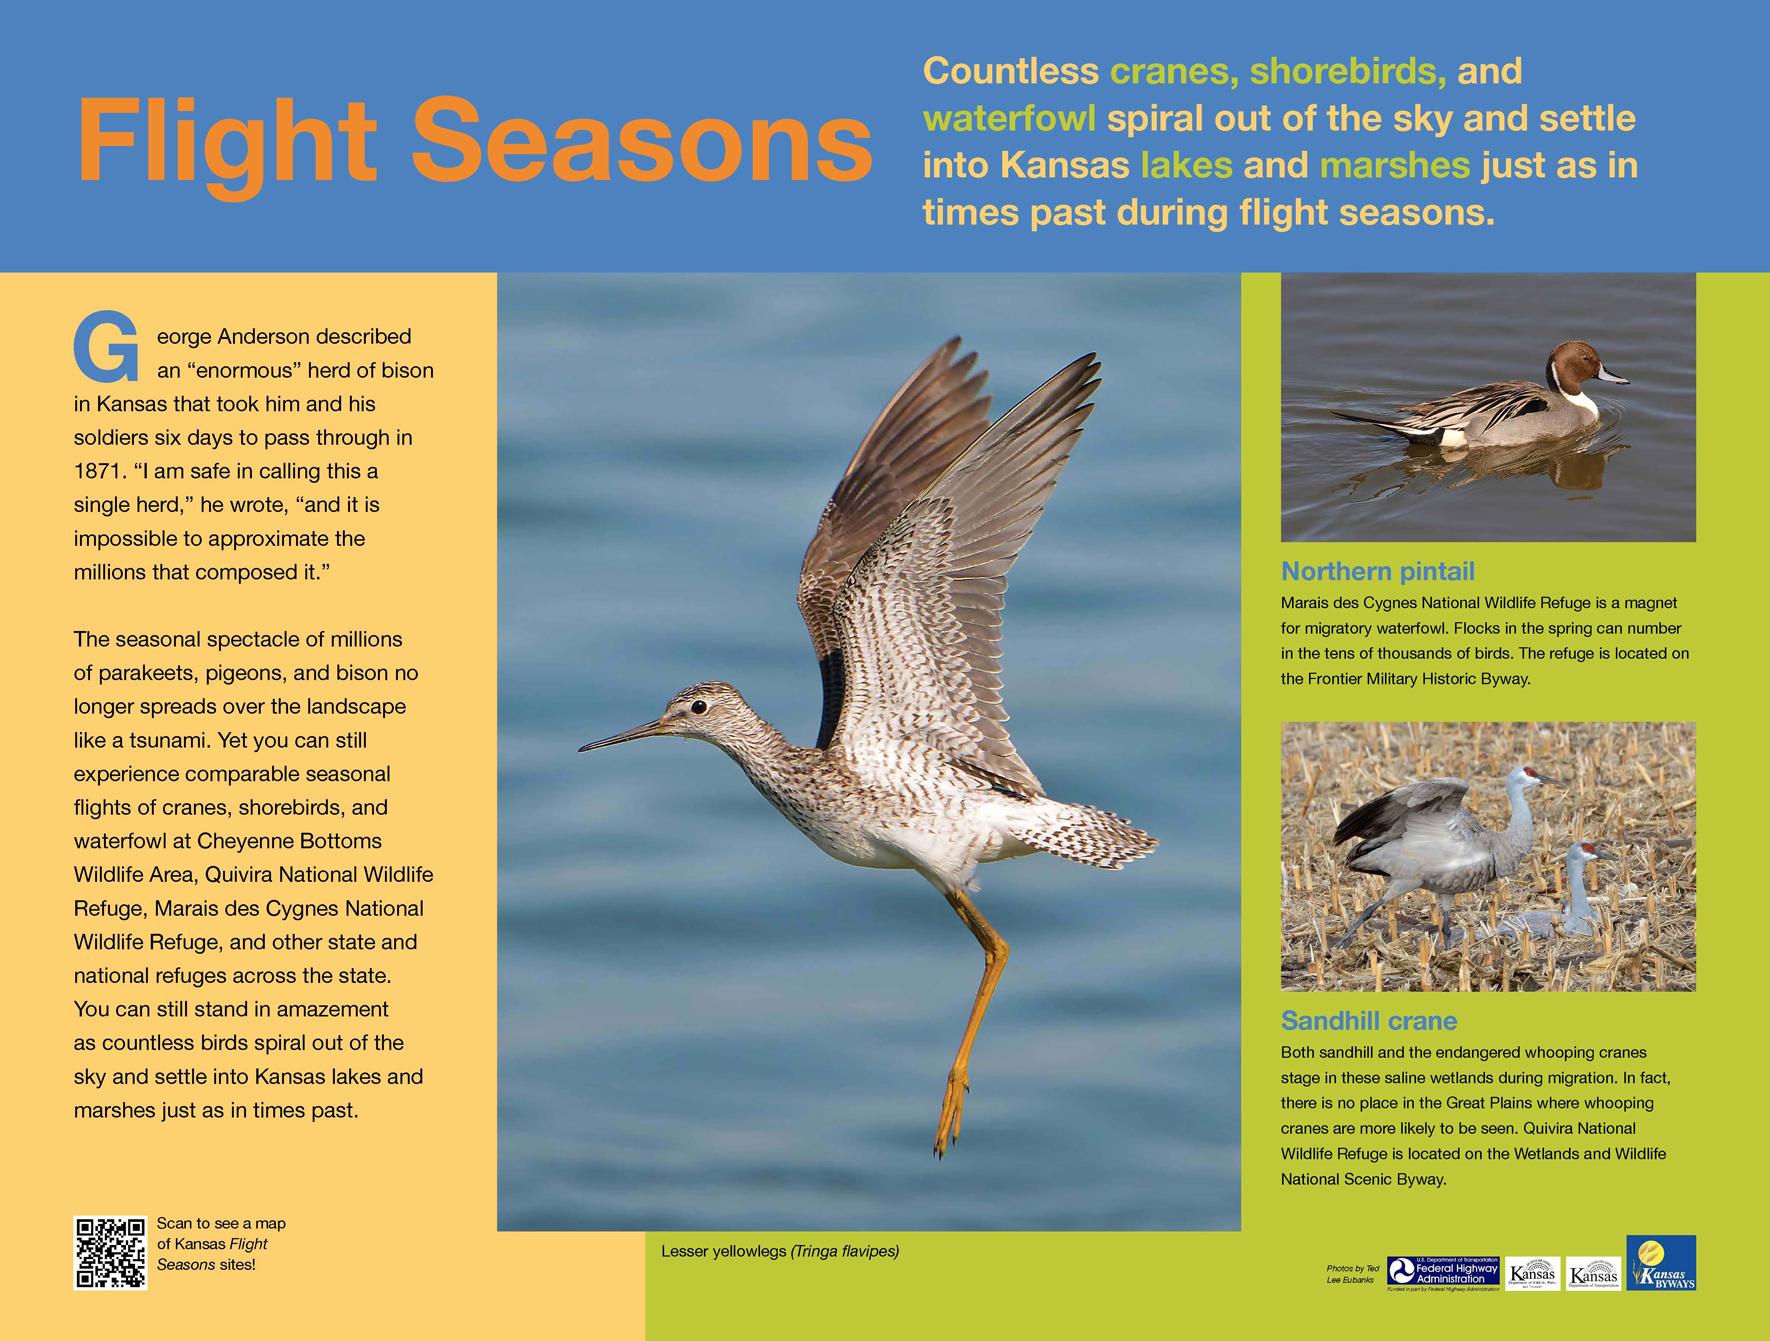 Kansas-Flight Seasons-3x4-091814